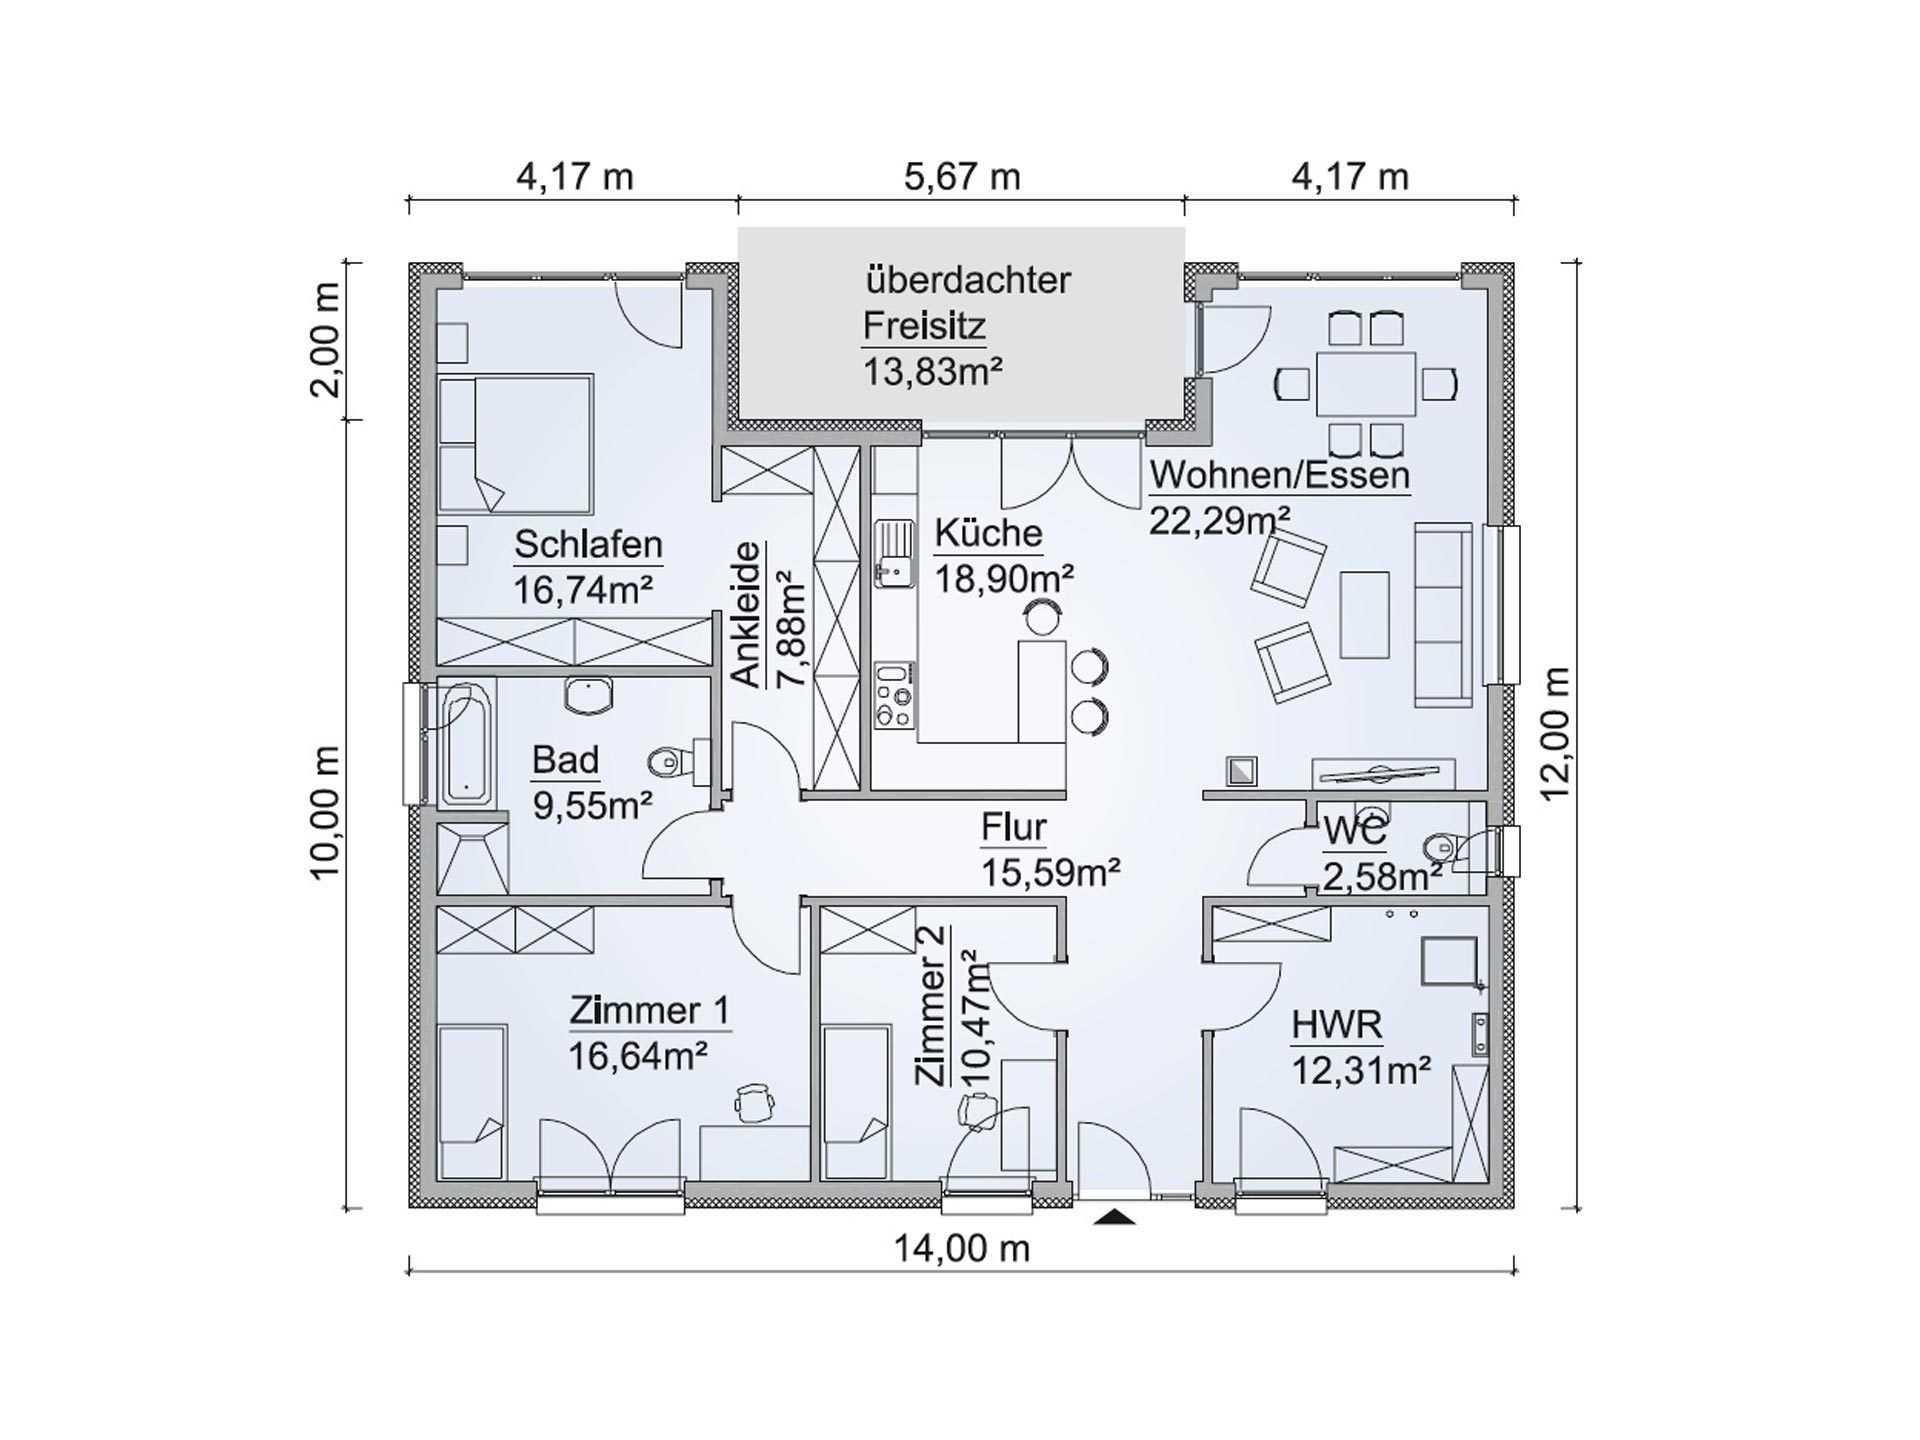 Modernen Bungalow Auf Musterhaus.Net Entdecken